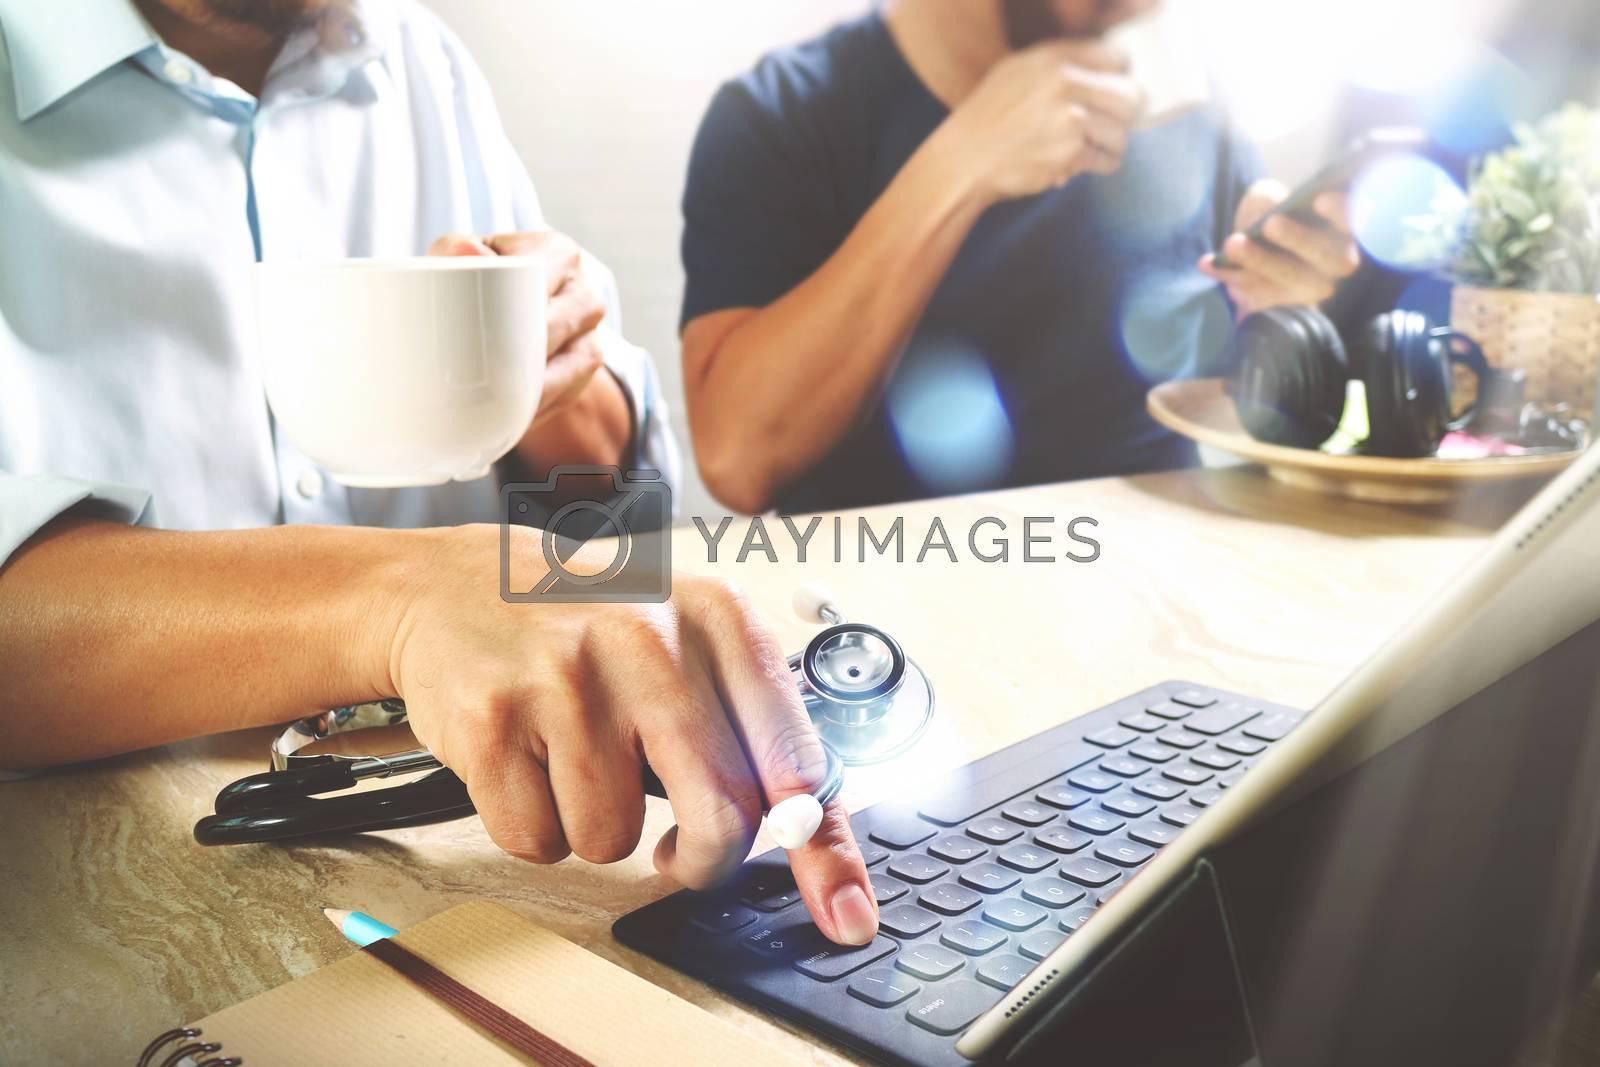 Medical doctor team taking coffee break.using digital tablet docking smart keyboard and smart phone on marble desk.listen music,filter film effect